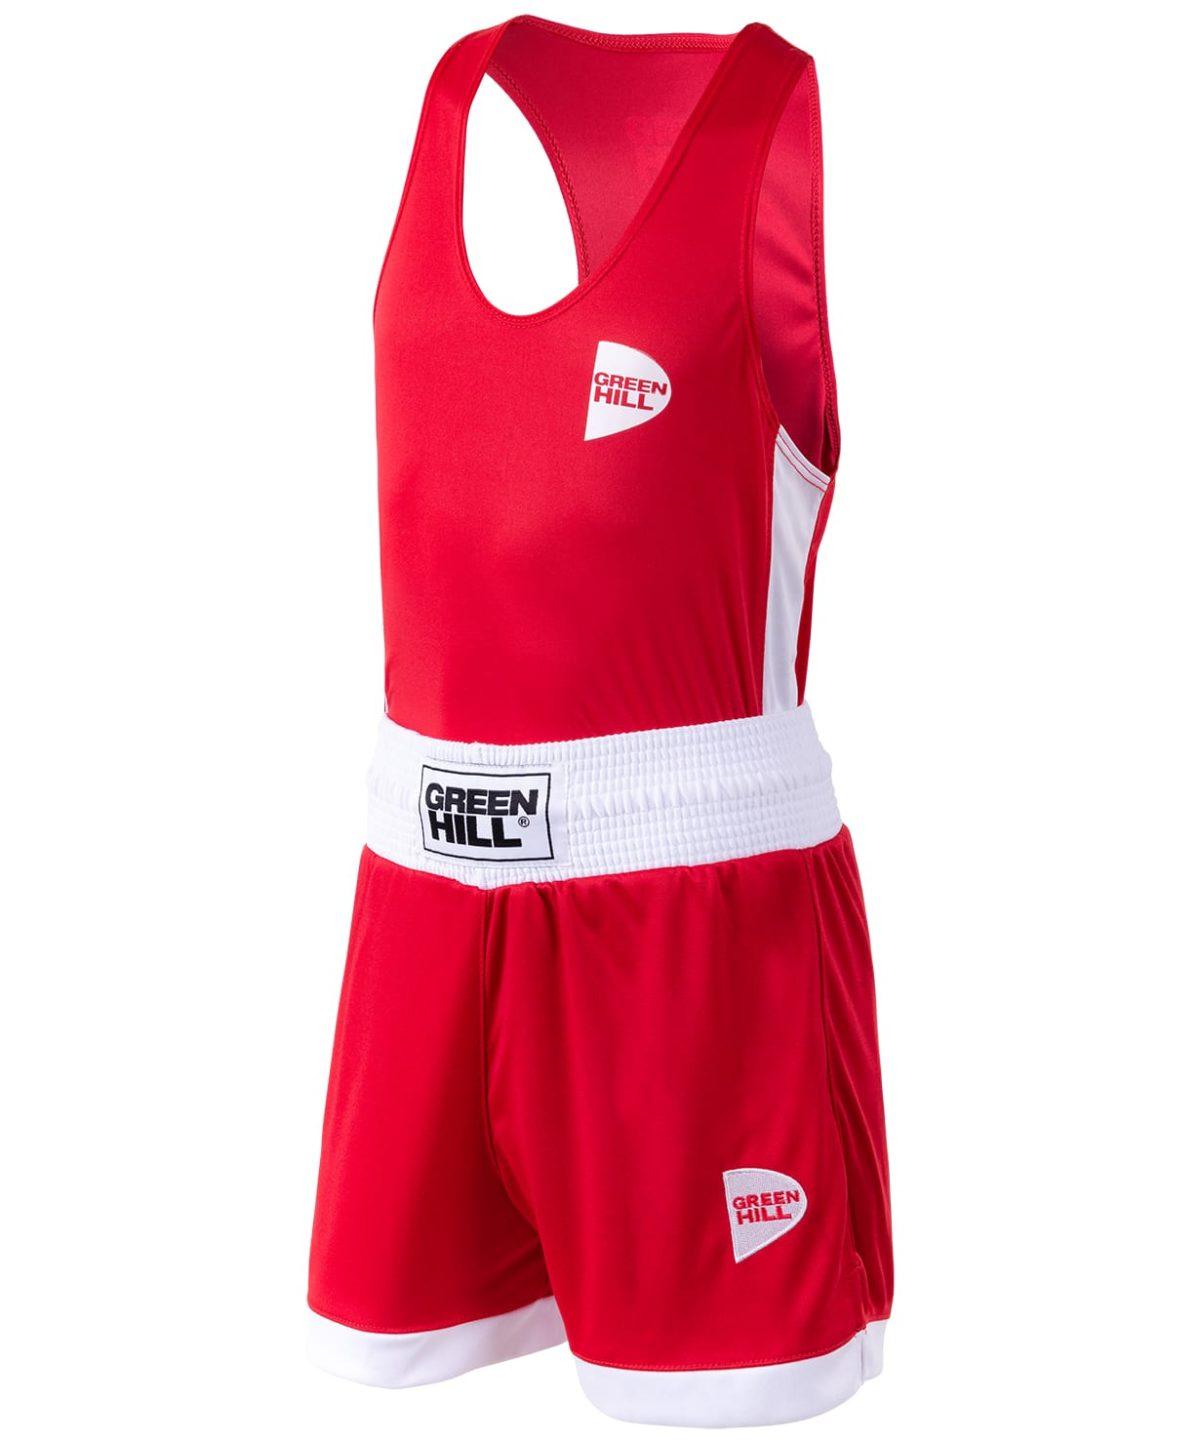 GREEN HILL Interlock Форма для бокса  BSI-3805: красный - 1